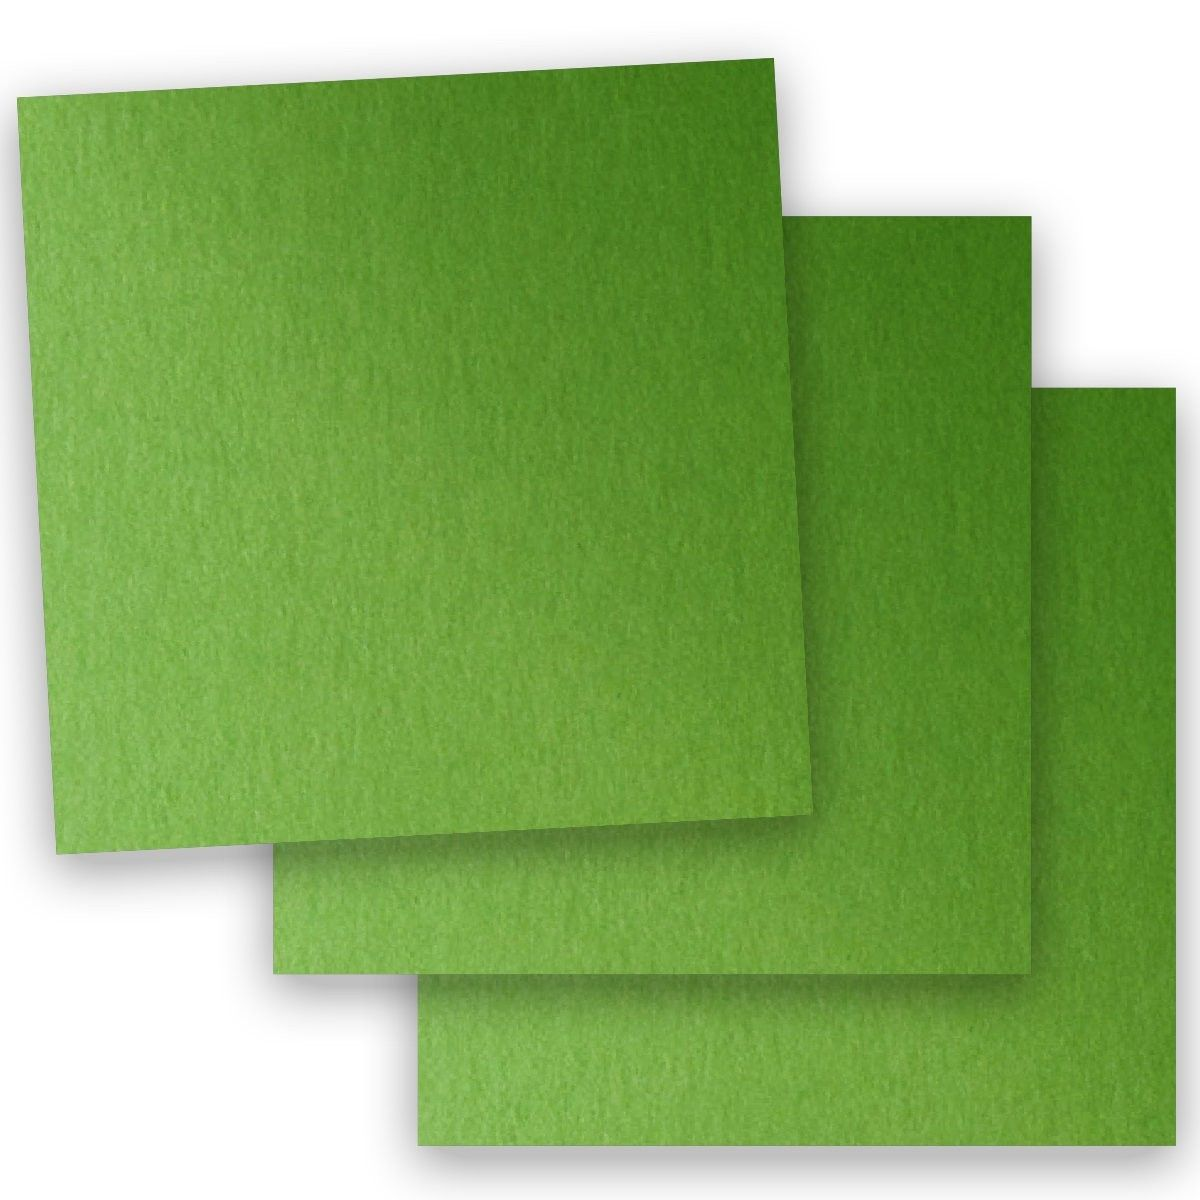 Stardream Metallic 12x12 Card Stock Paper Fairway 105lb Cover 284gsm 35 Pk In 2021 Cardstock Paper Paper Cover Paper